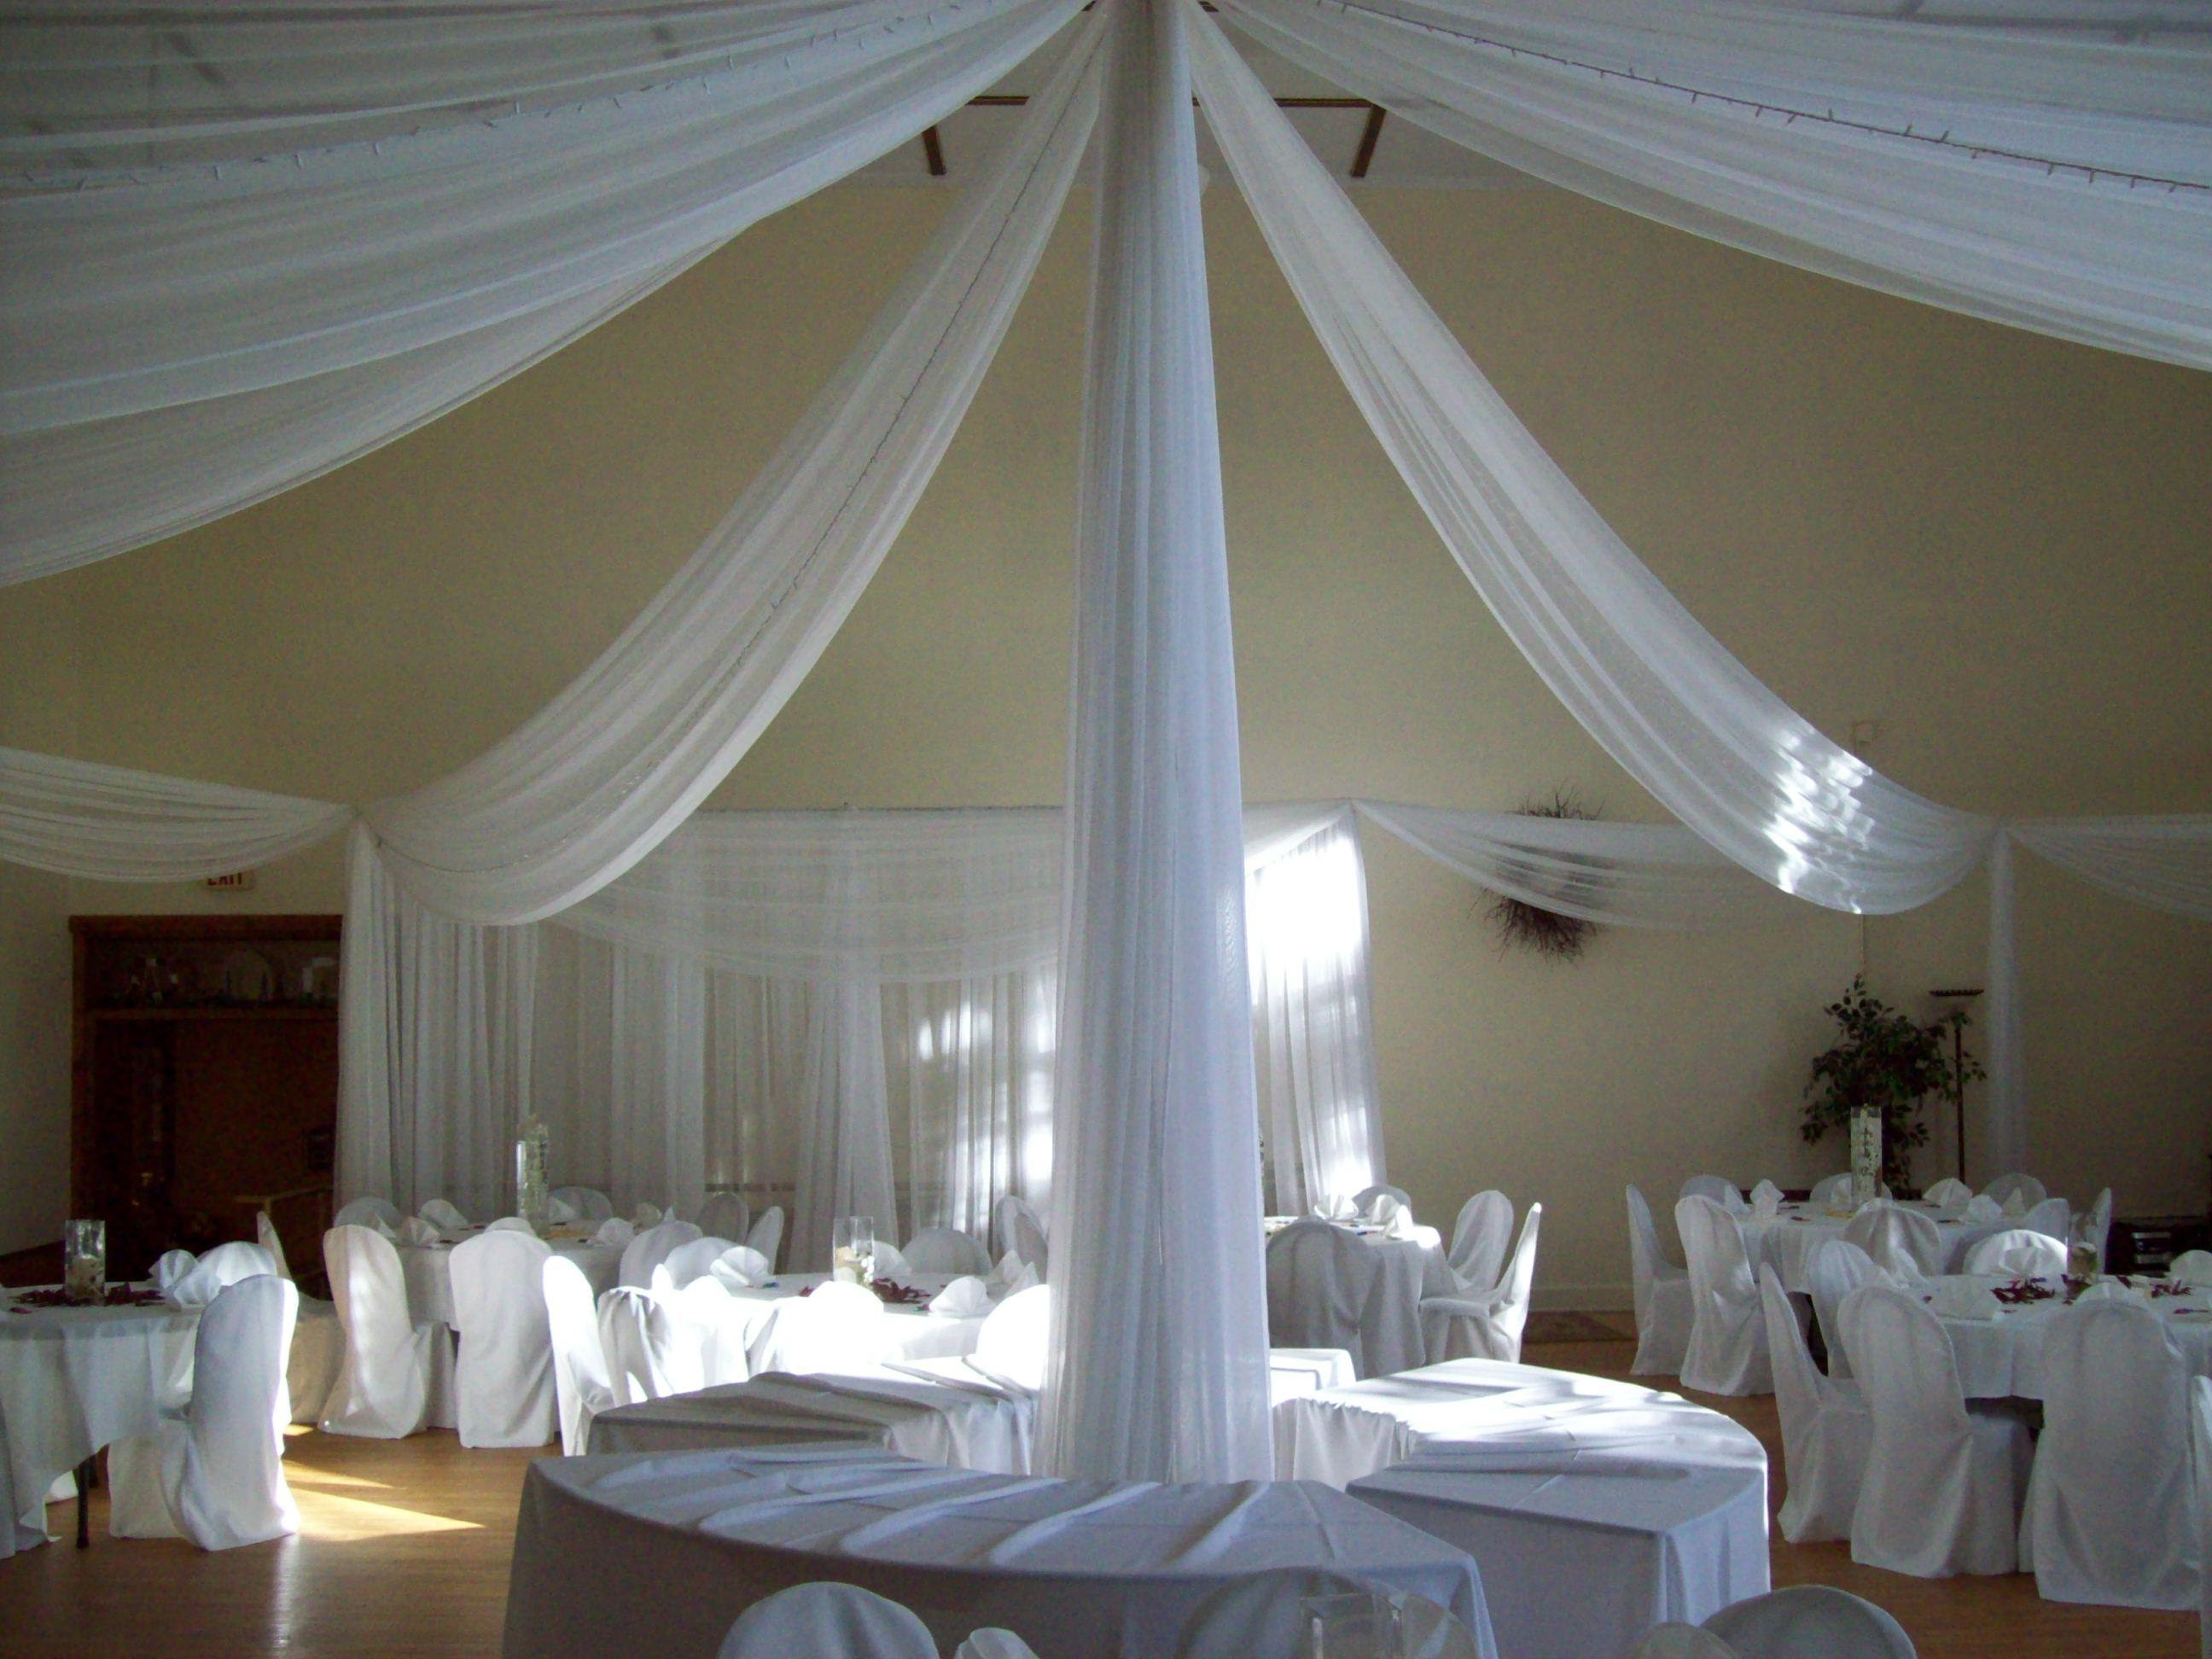 Wedding decorations for hall  wedding draping  Backdrop  Pinterest  Wedding draping Wedding